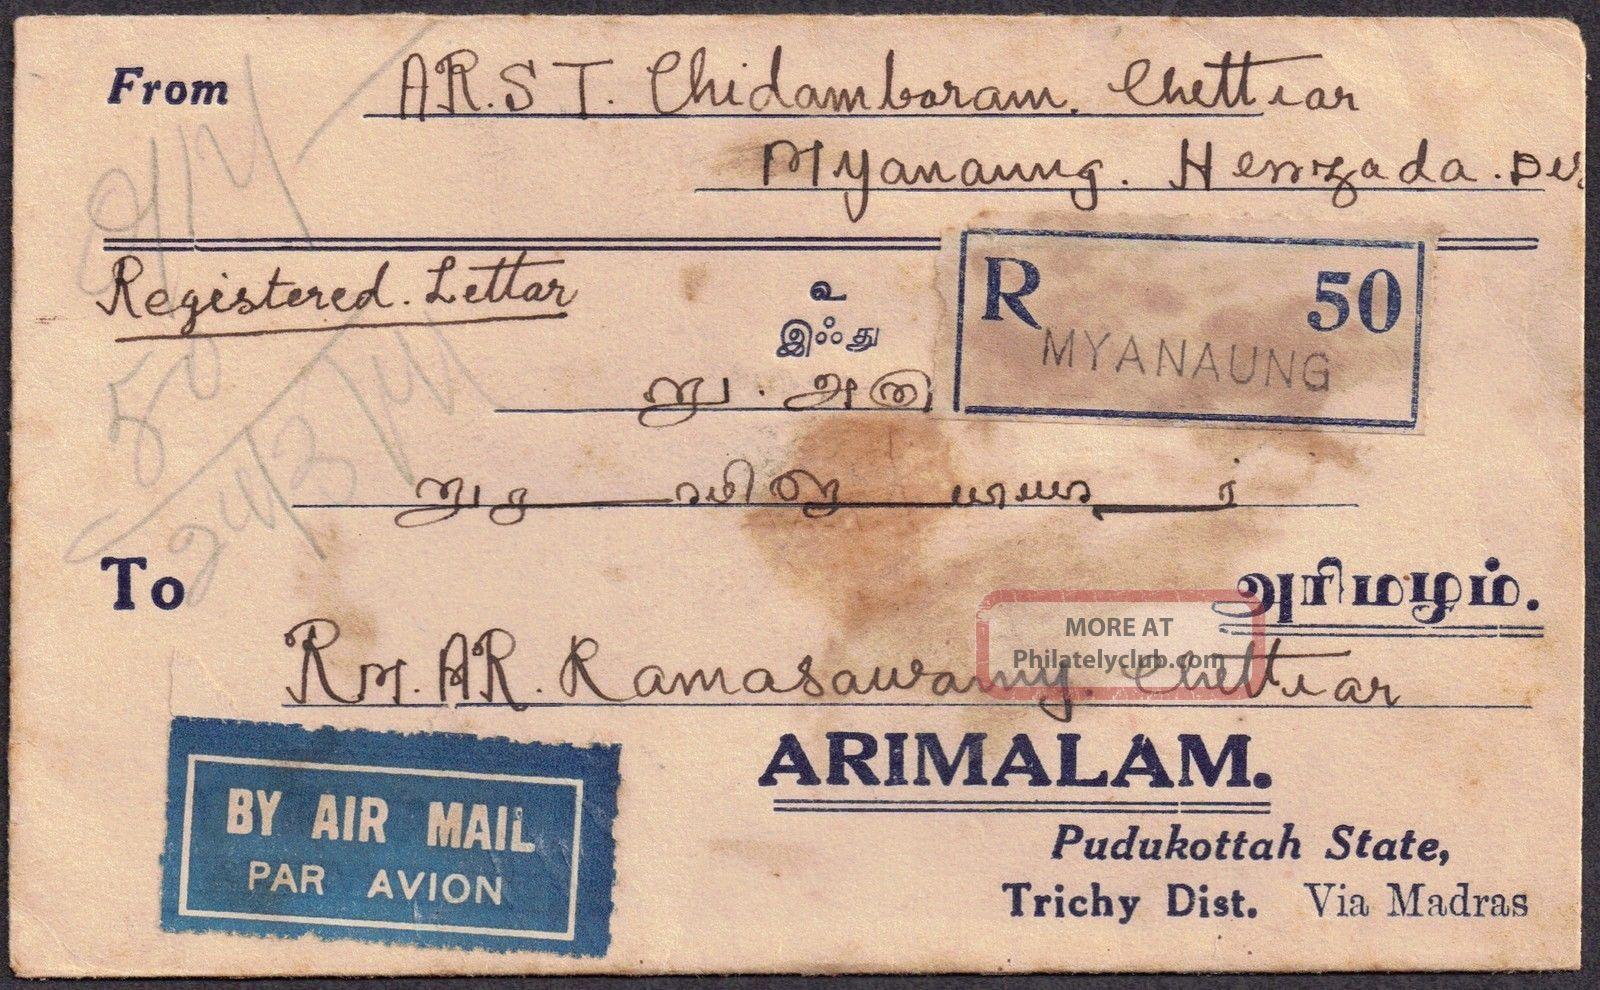 Burma 1937 6a Sg 10 Reg ' D Envelope Myanaung 24 Mar 1941 To Pudukottah State British Colonies & Territories photo